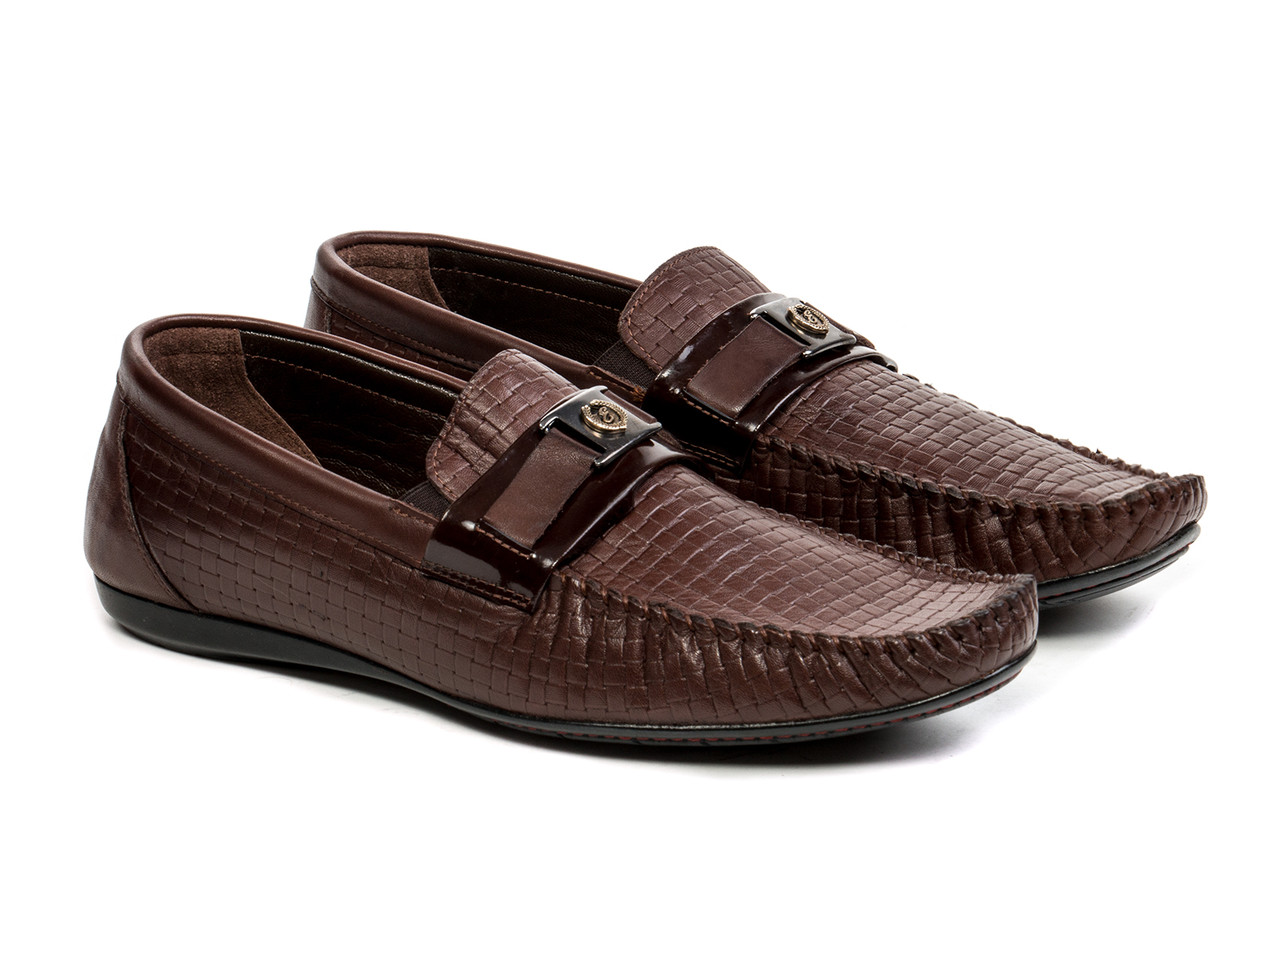 Мокасины Etor 13252-11601-52-199 41 коричневые